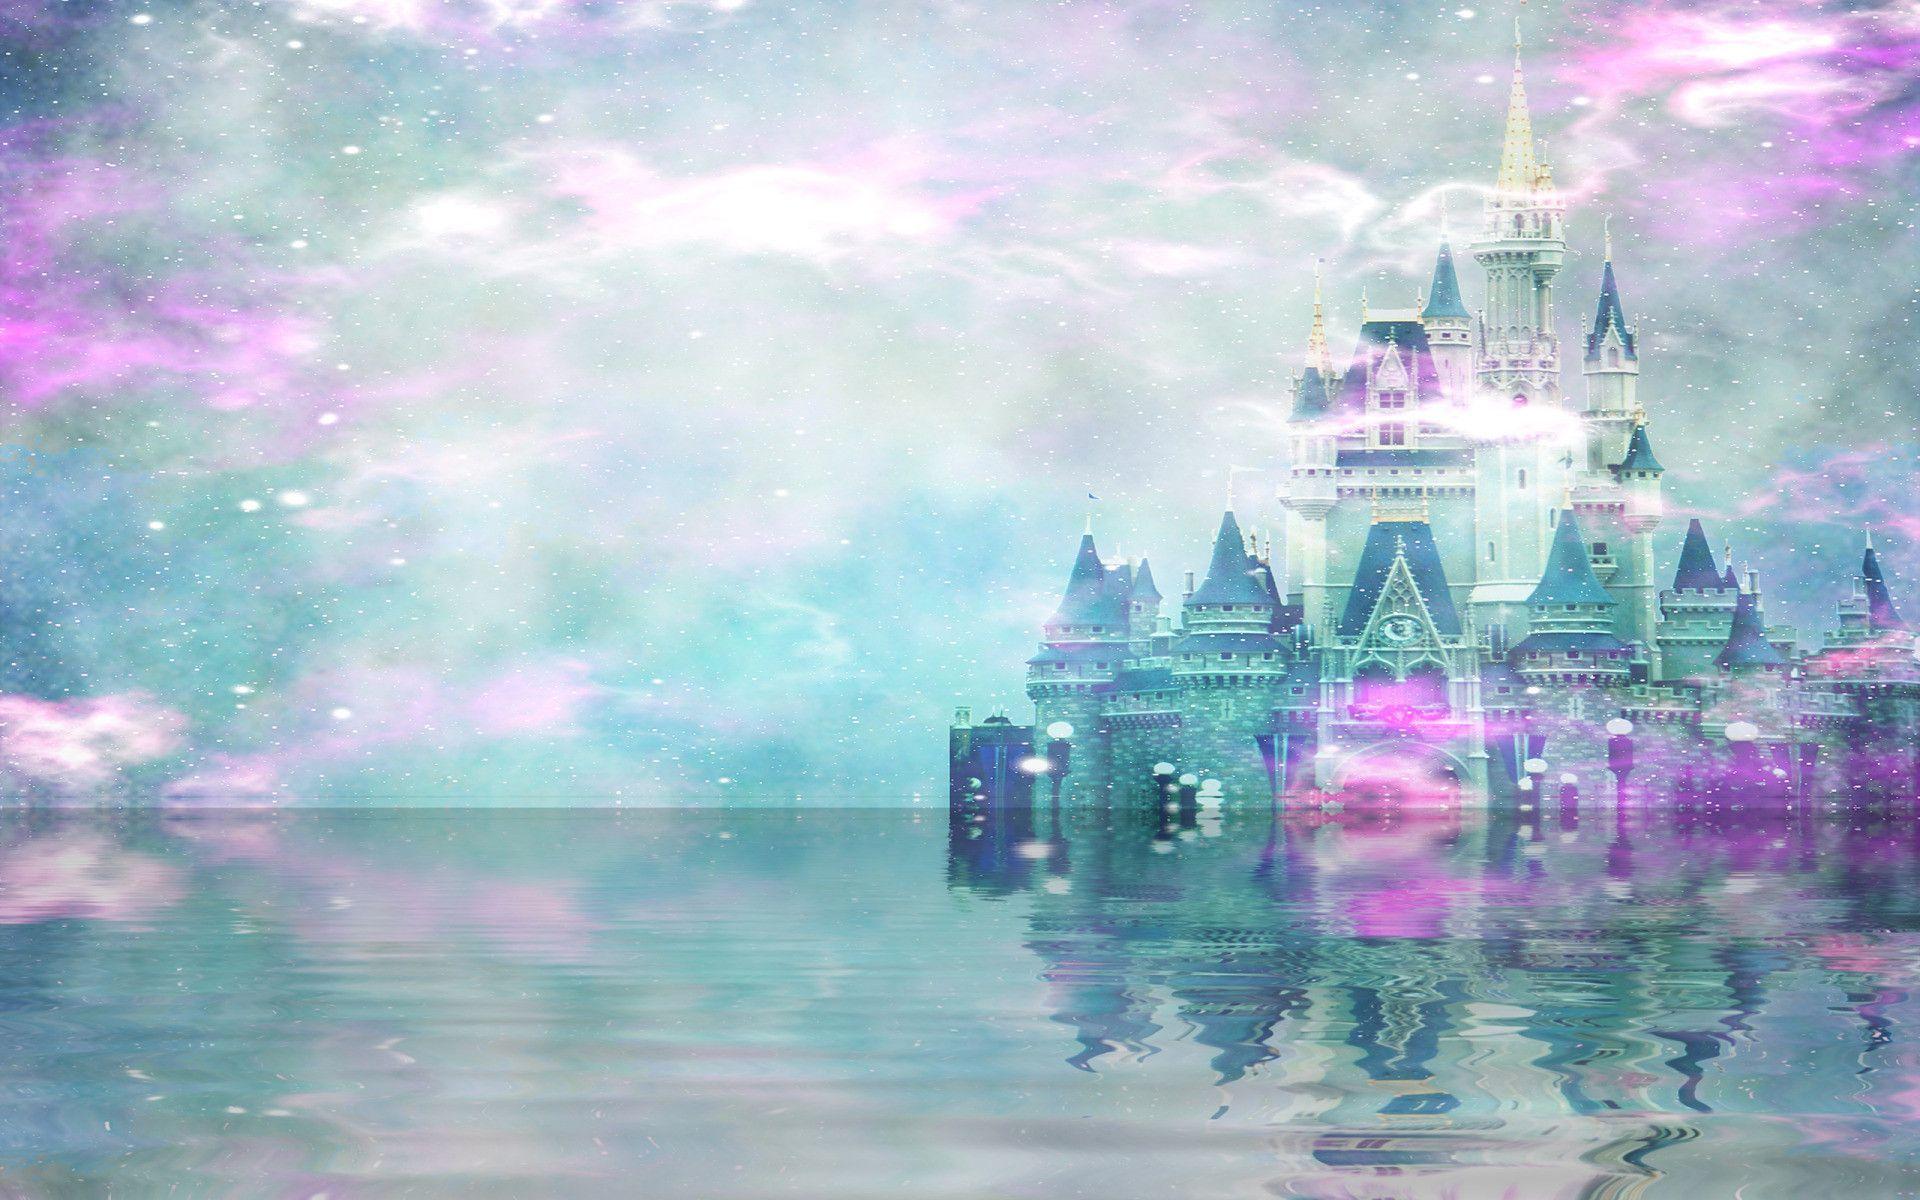 Fairy Tale Backgrounds Fairy Tales Fairy Background Fairytale Castle